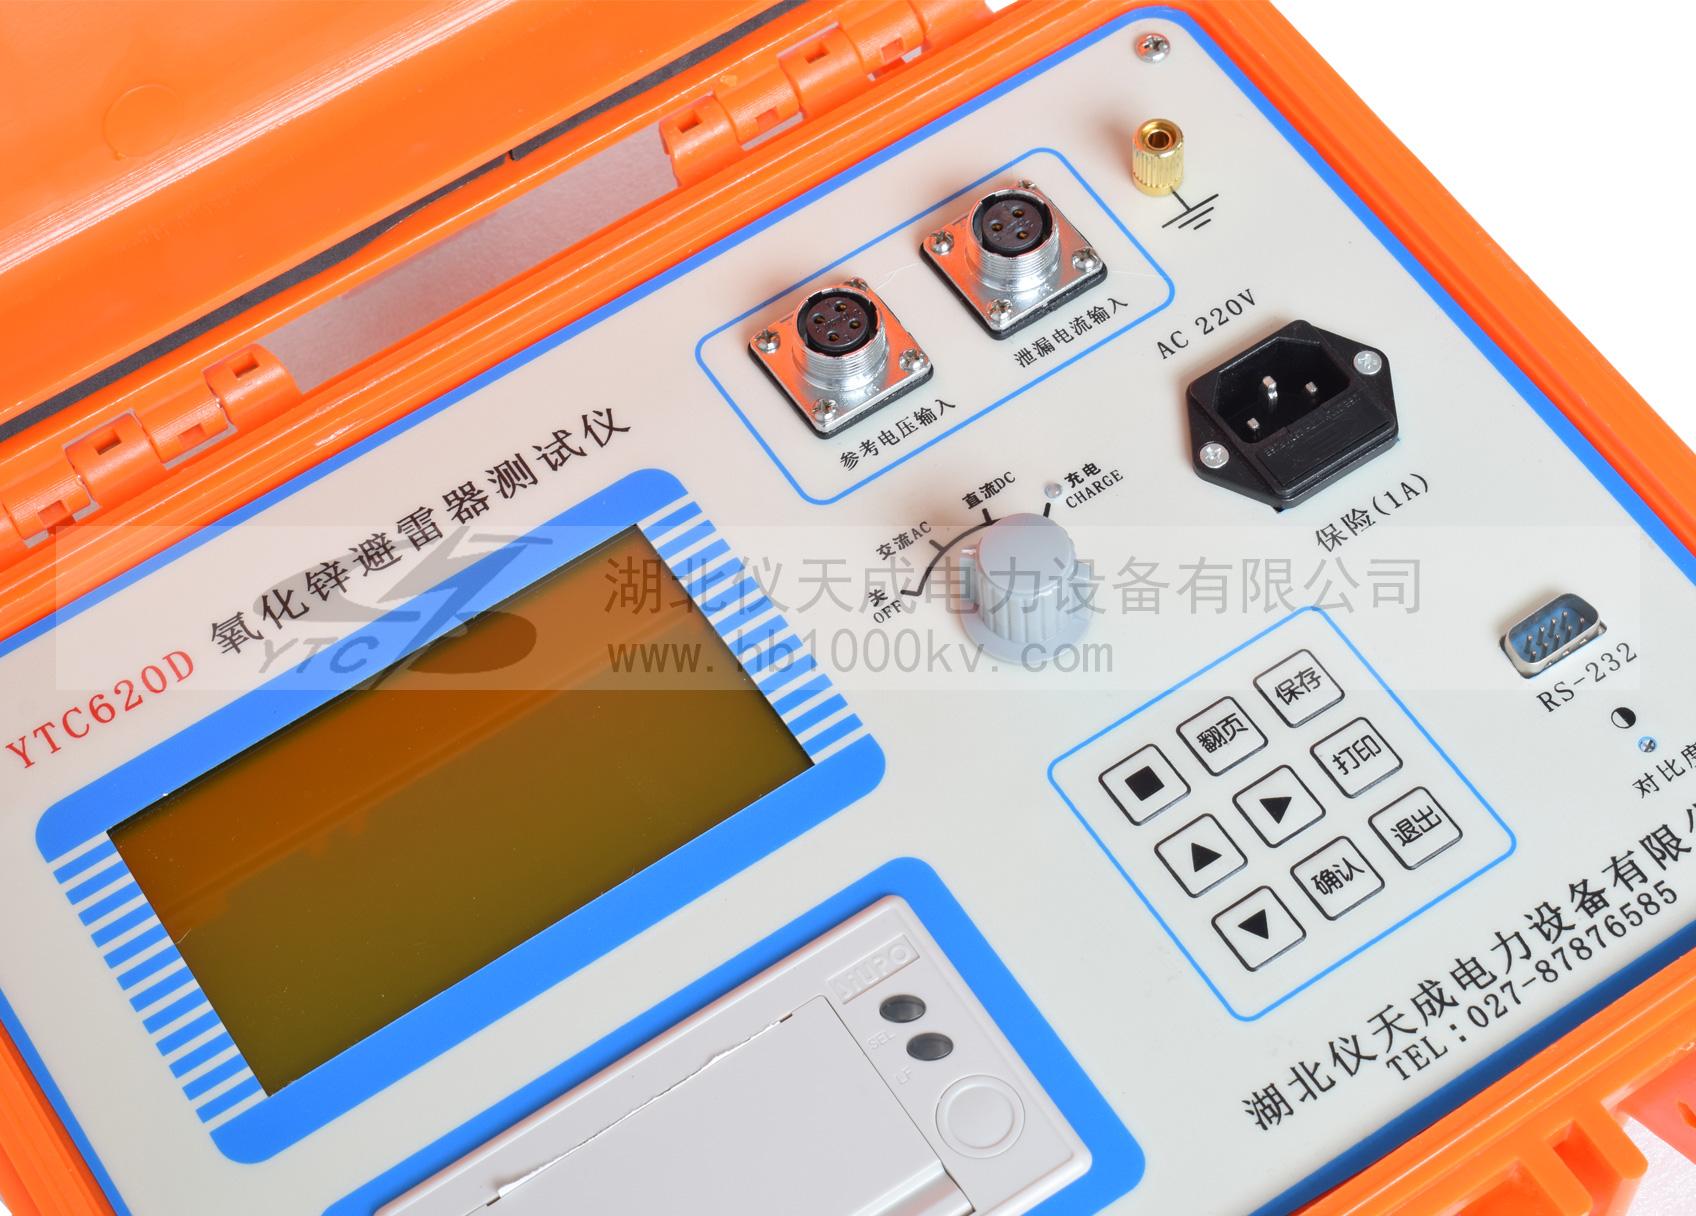 YTC620D氧化锌避雷器测试仪面板图